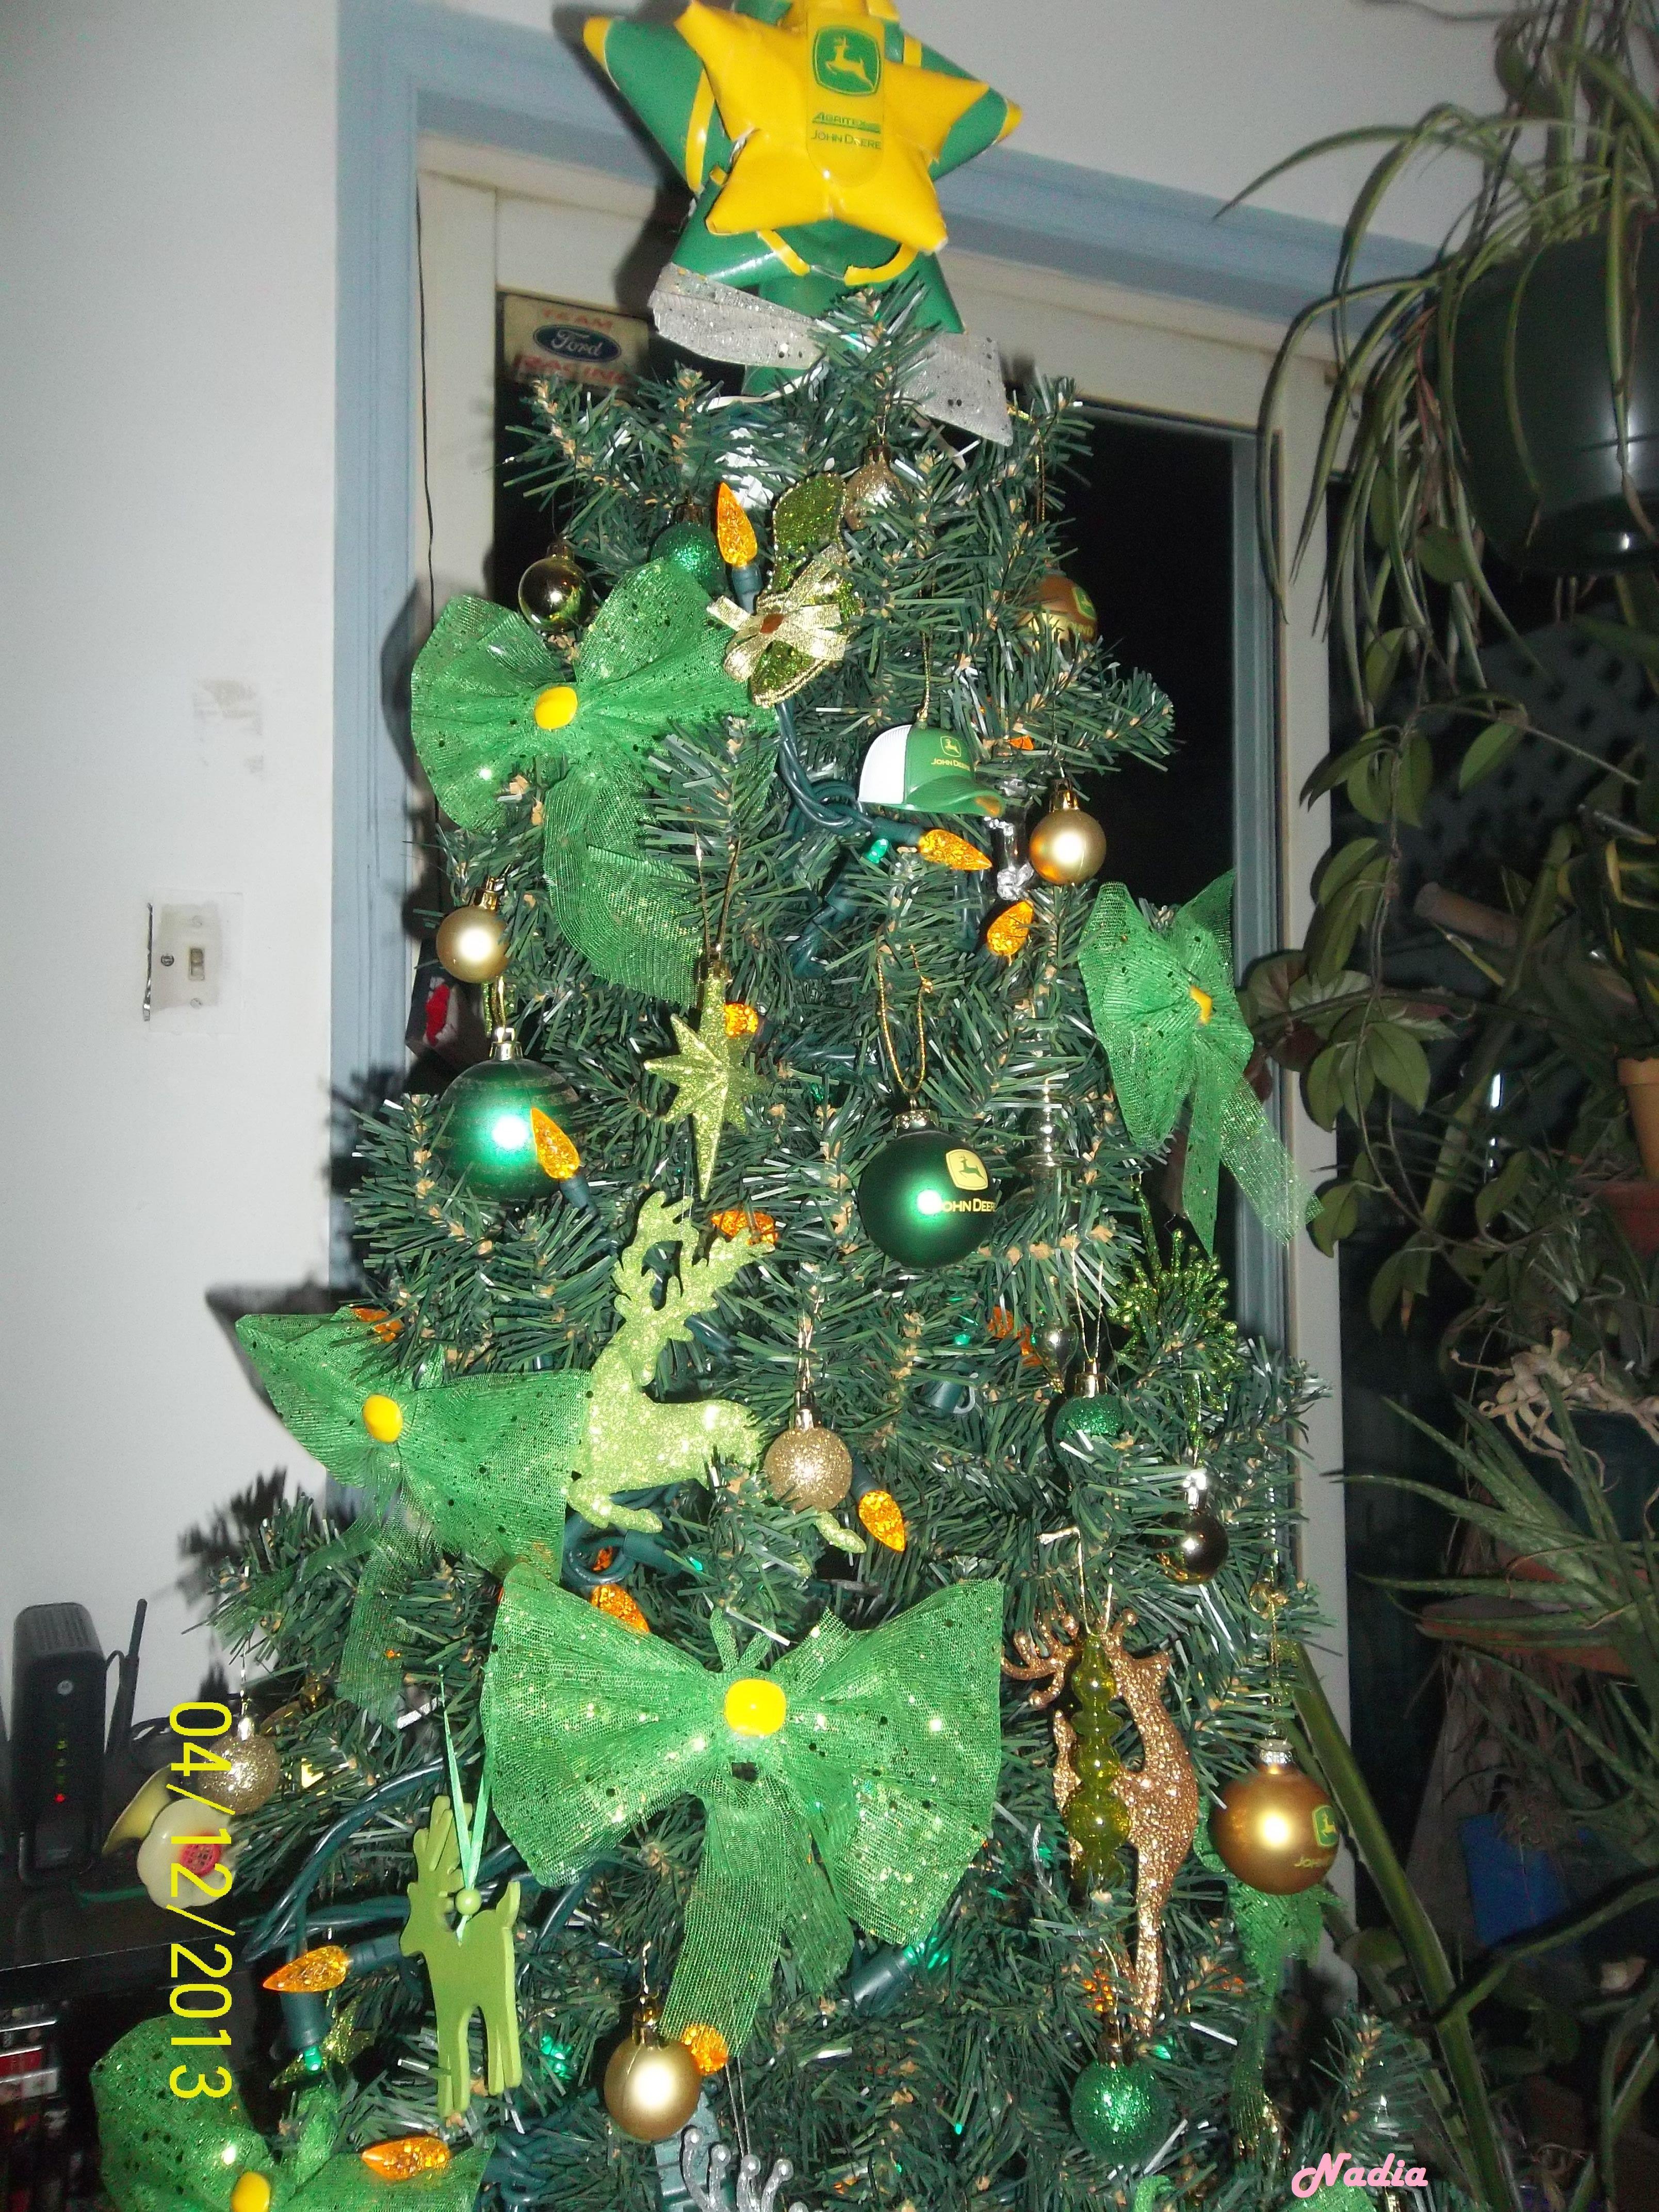 John Deere christmas tree by nadia | Christmas Trees | Pinterest ...